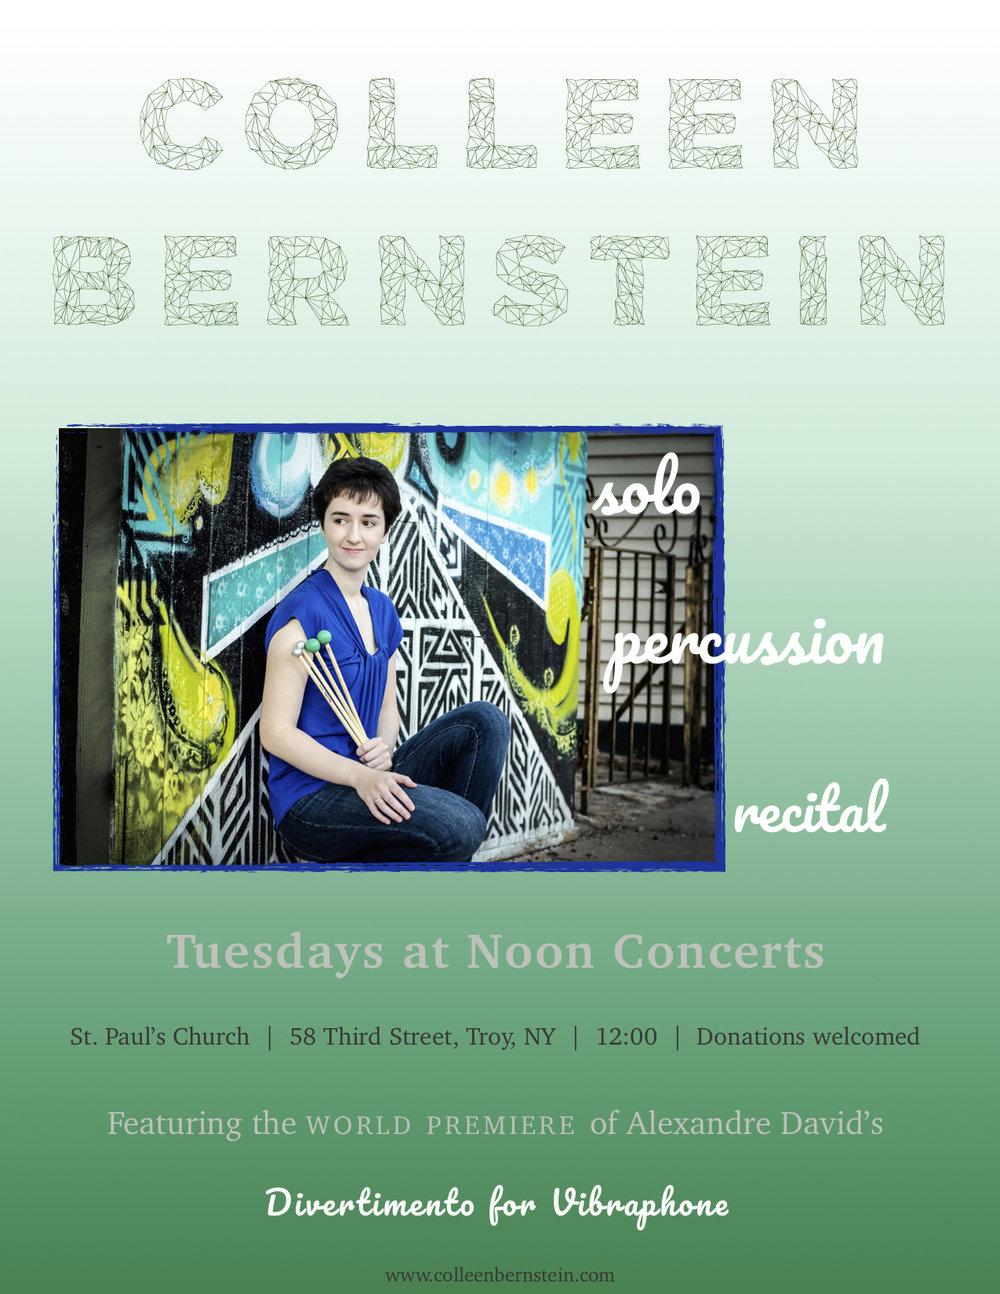 Solo Concert Dec 18 Poster.jpg